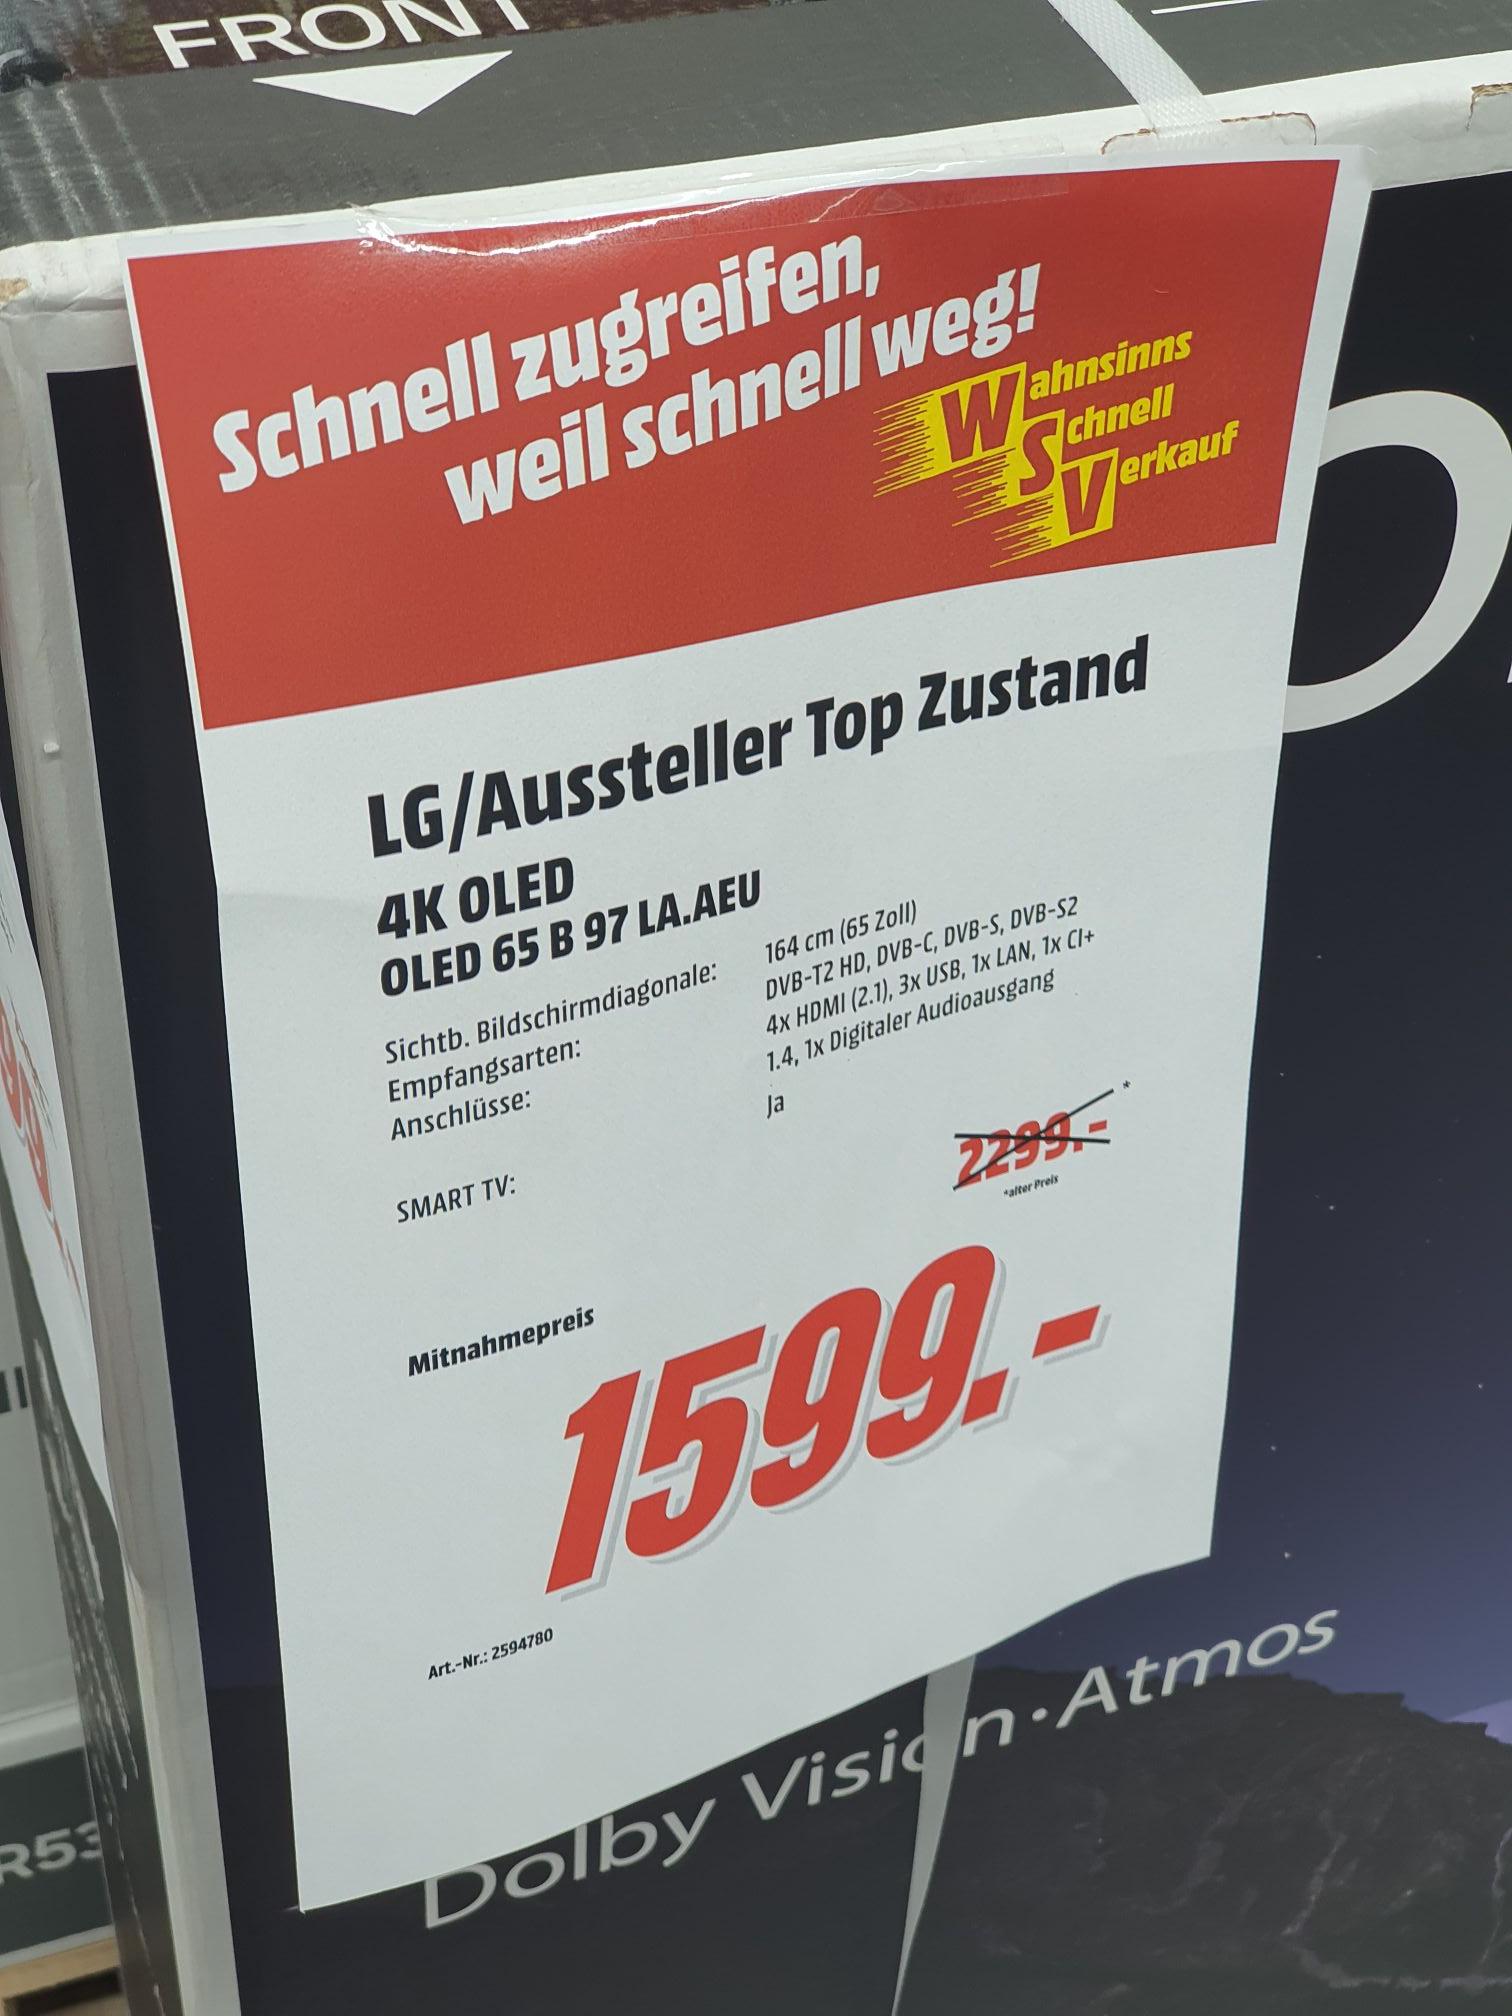 [Lokal Köln - Media Markt] LG Oled 65 B9 Aussteller